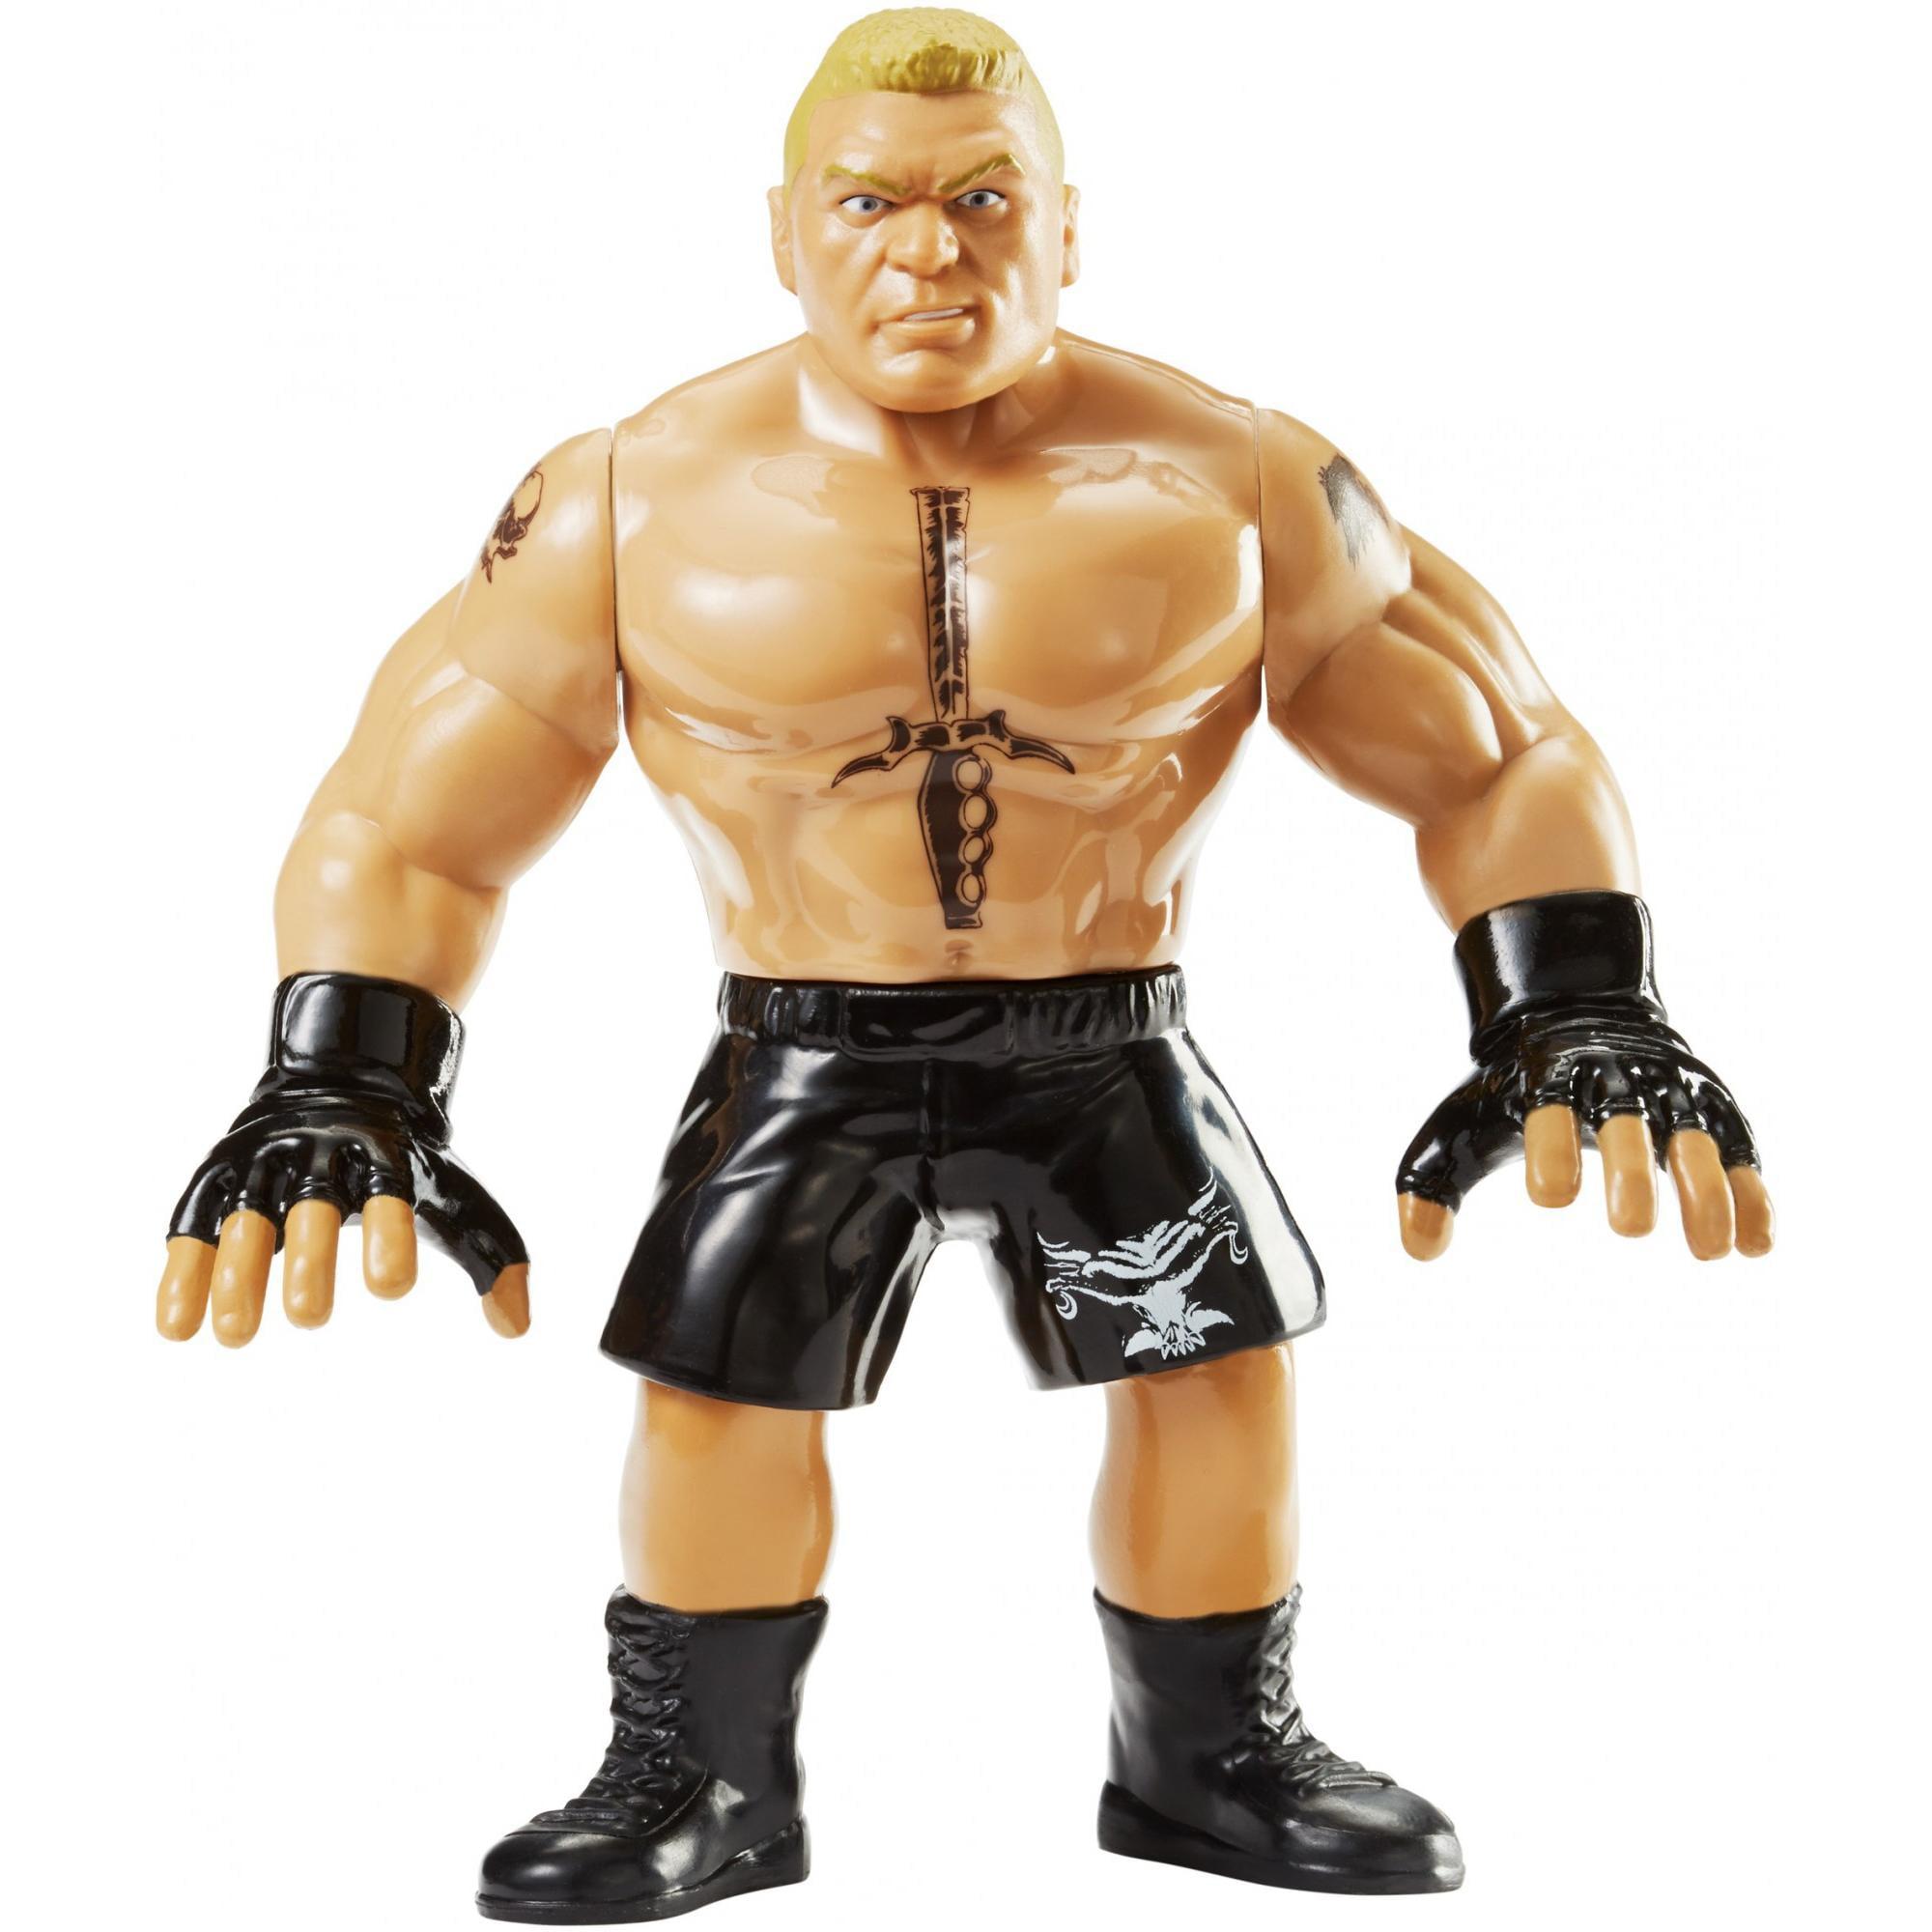 WWE Brock Lesnar Retro Figure by Mattel